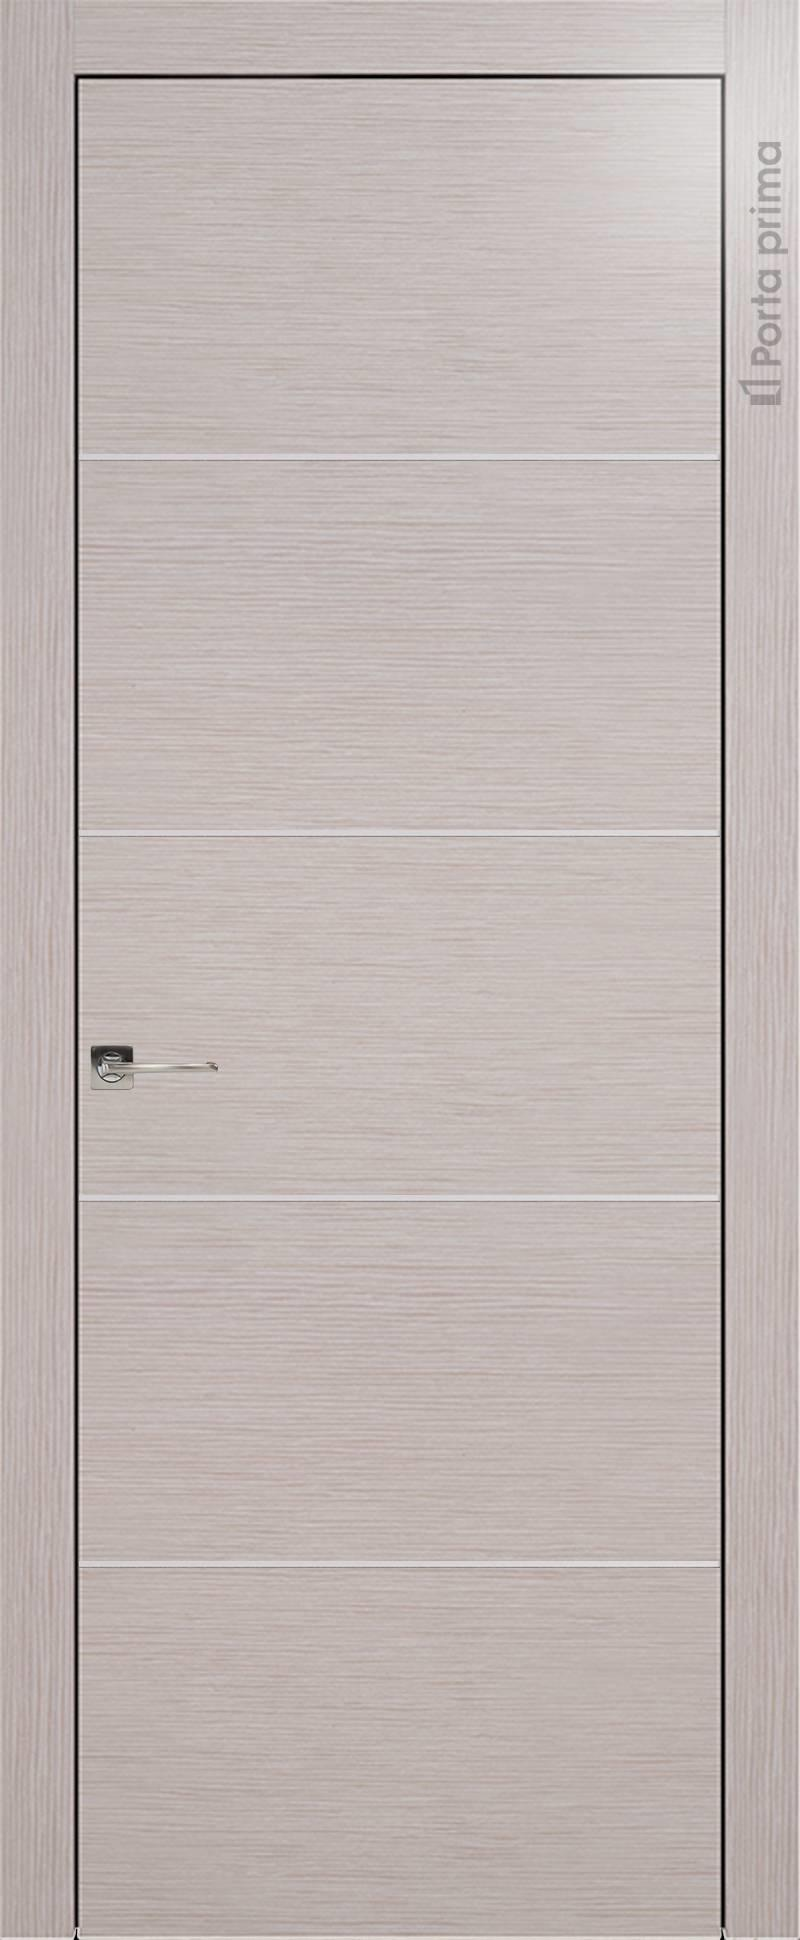 Tivoli Д-3 цвет - Дымчатый дуб Без стекла (ДГ)